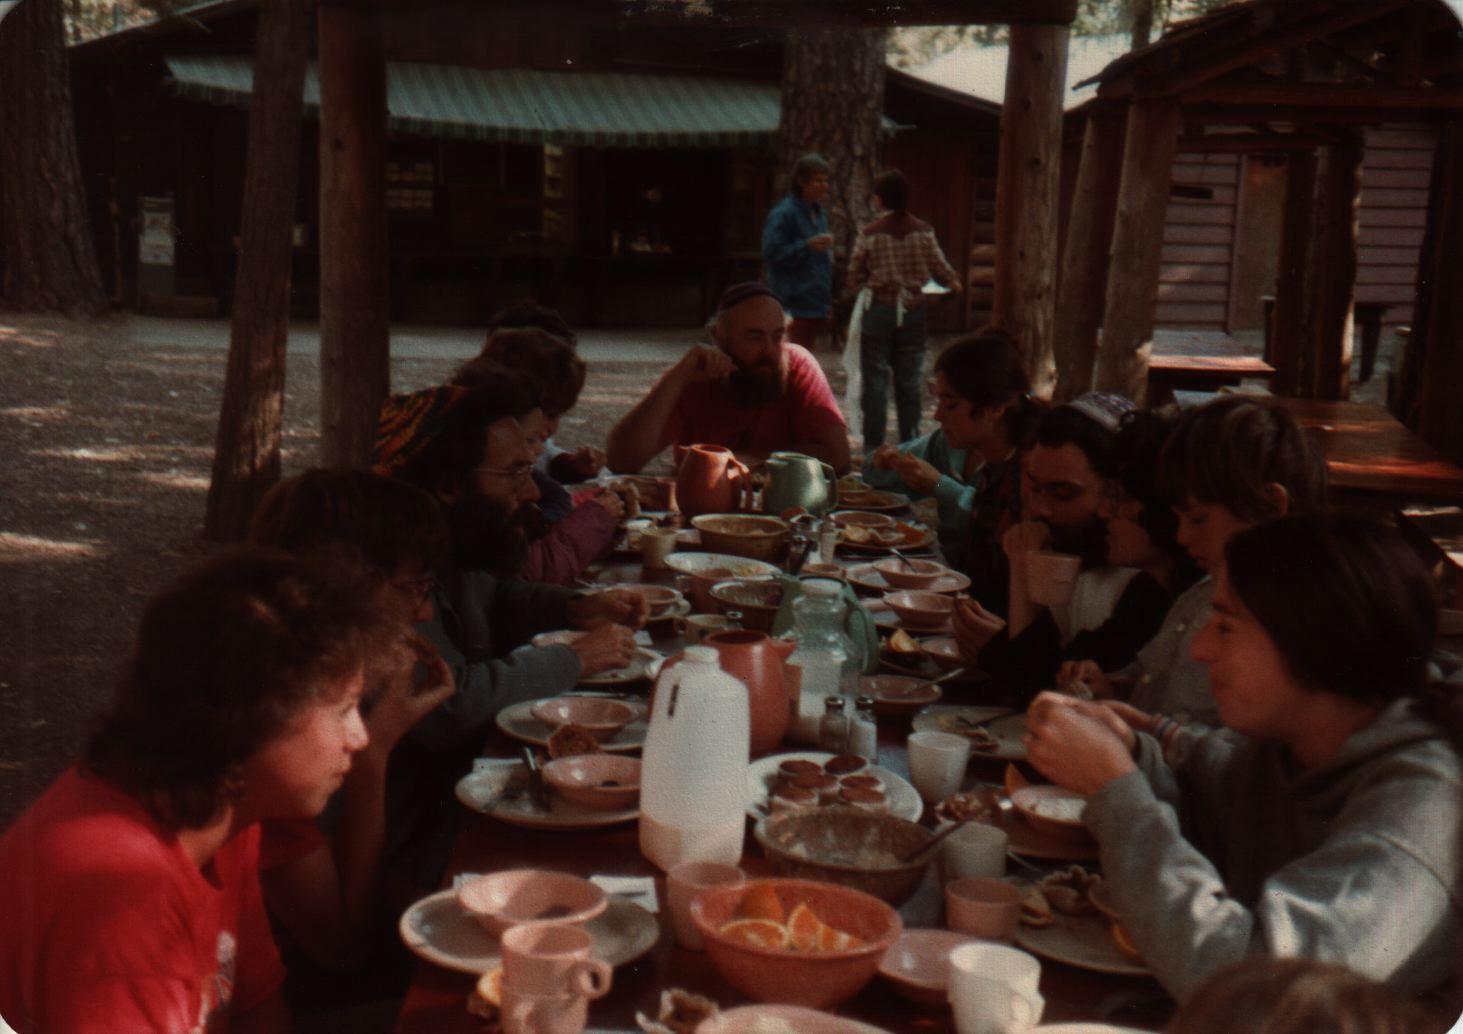 84 Joys  Mealtime, incl Maya Wallach,Yeshayah Goldfarb, Jeff Oboler, Sharon Alexander, Brian (Benyomin) Adilman, Keith Whithaker copy.jpg